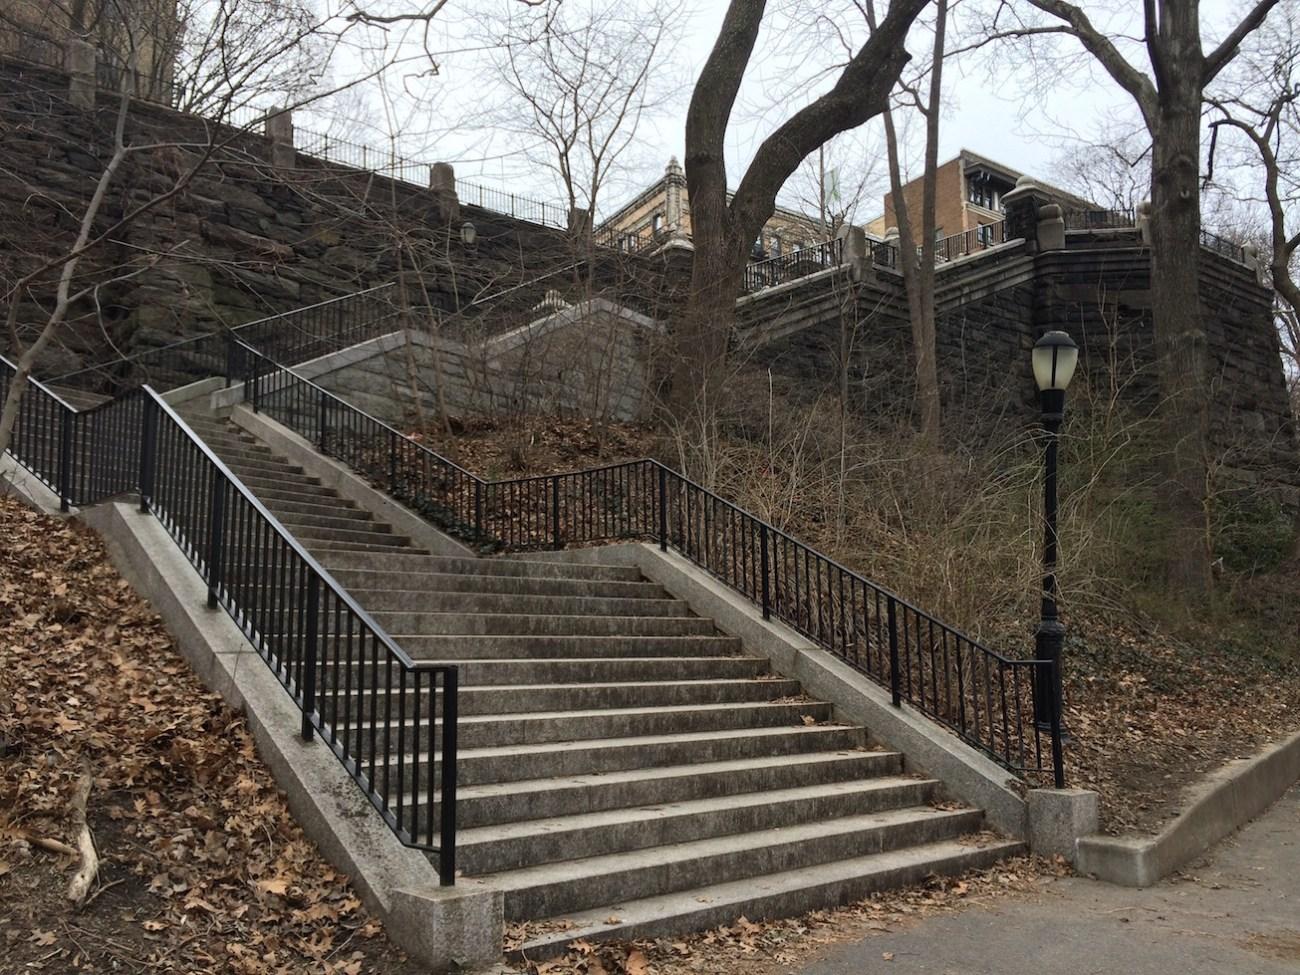 Morningside Park Stair Workout 21